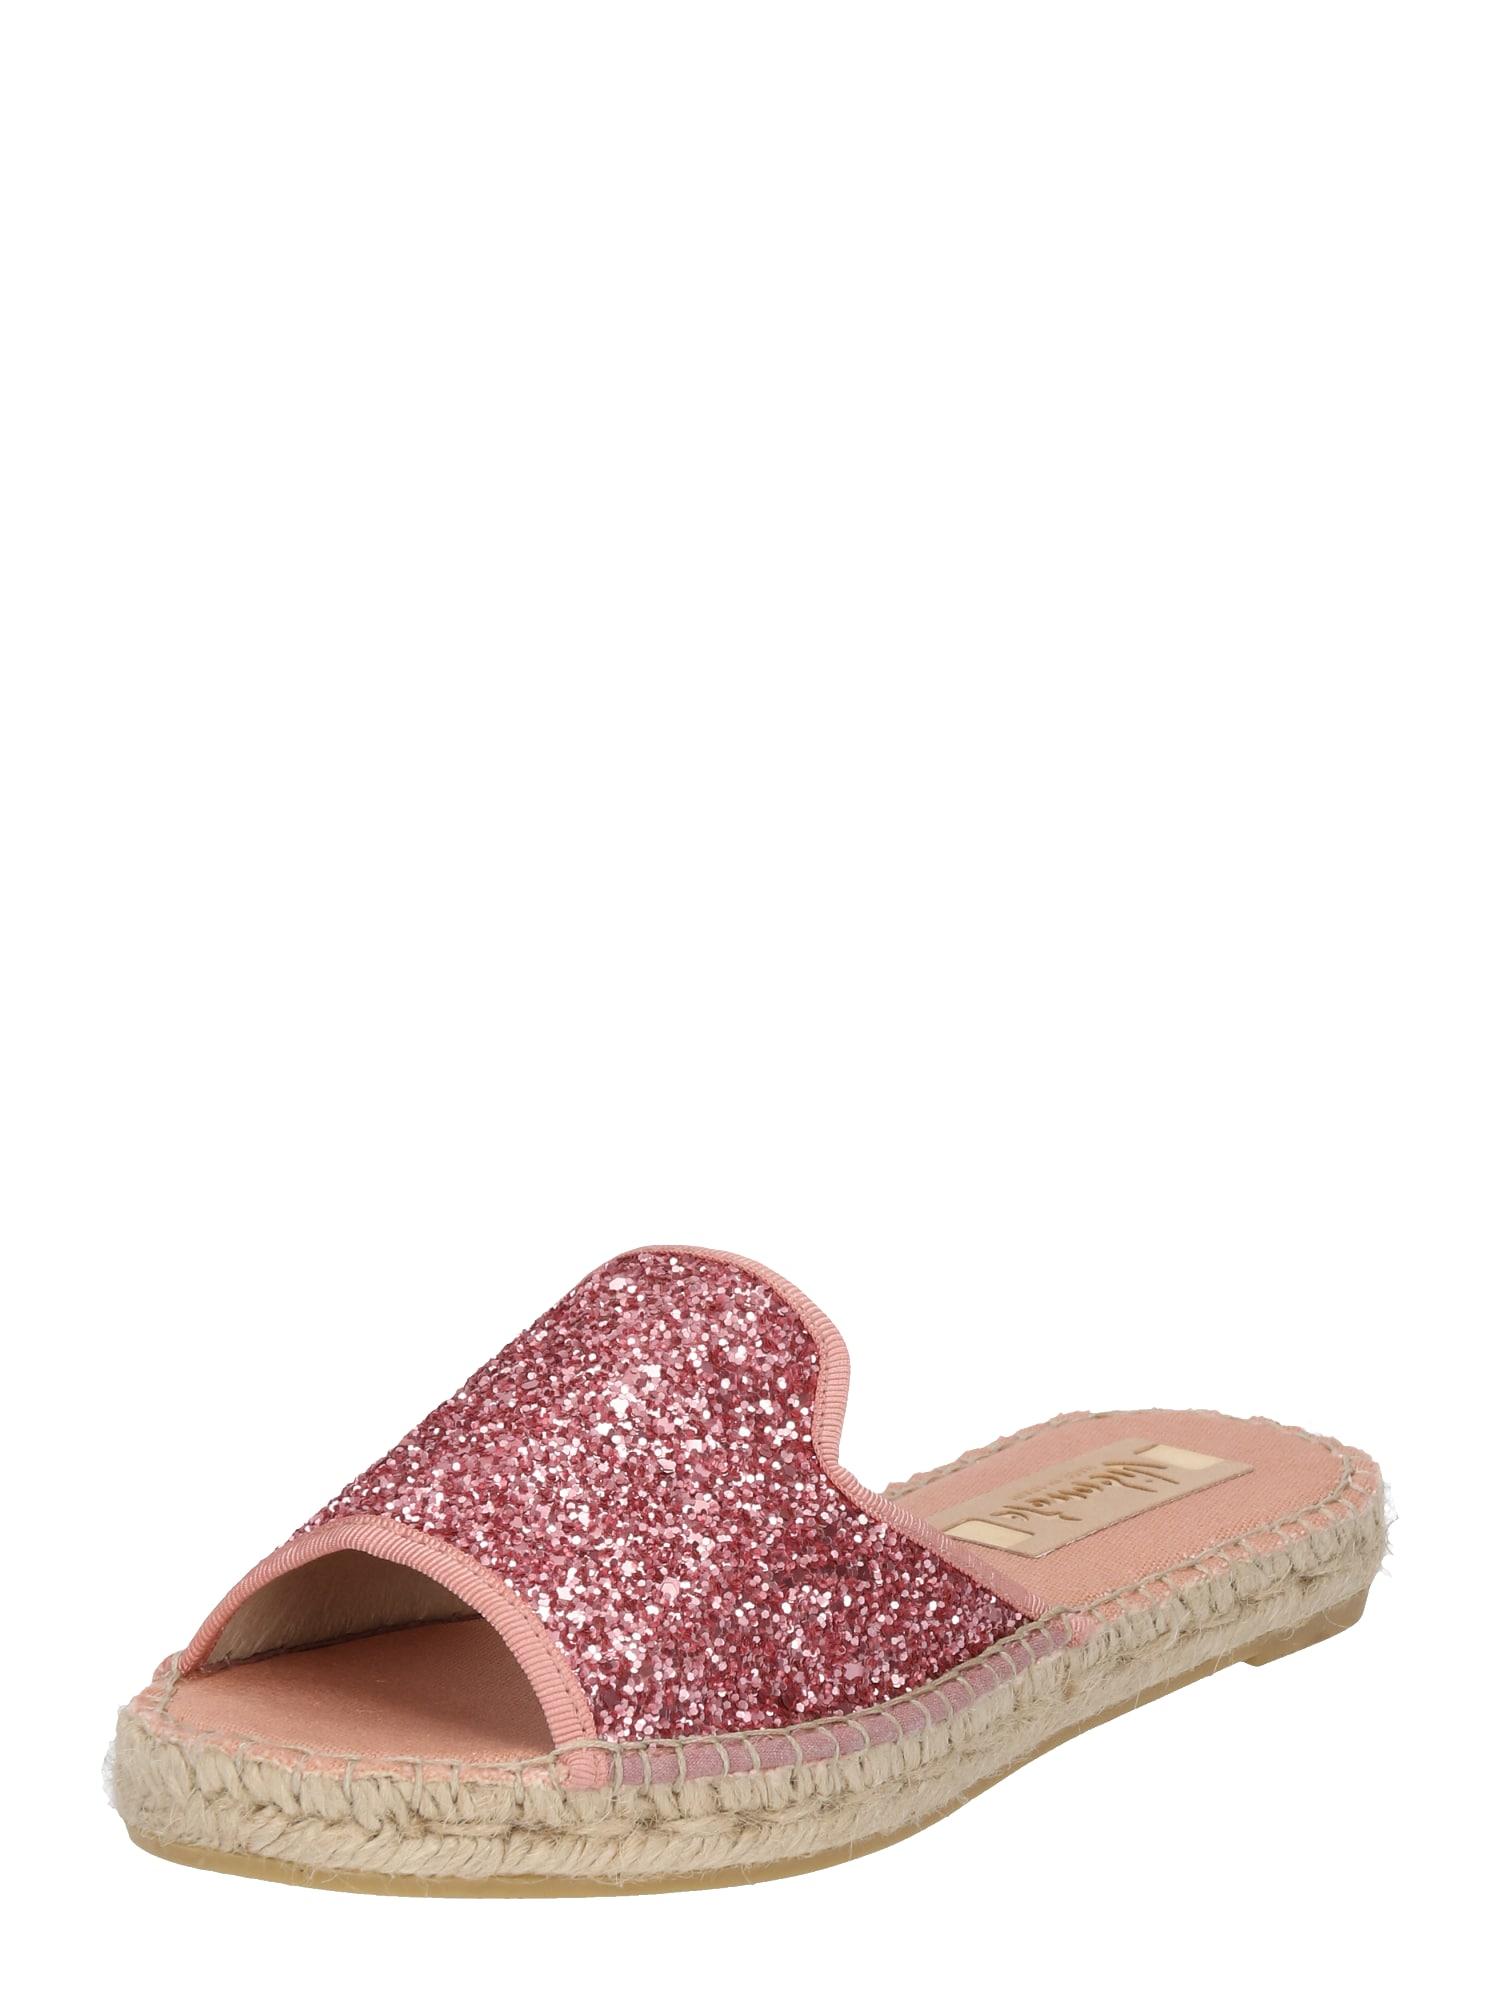 Pantofle starorůžová tmavě růžová Vidorreta